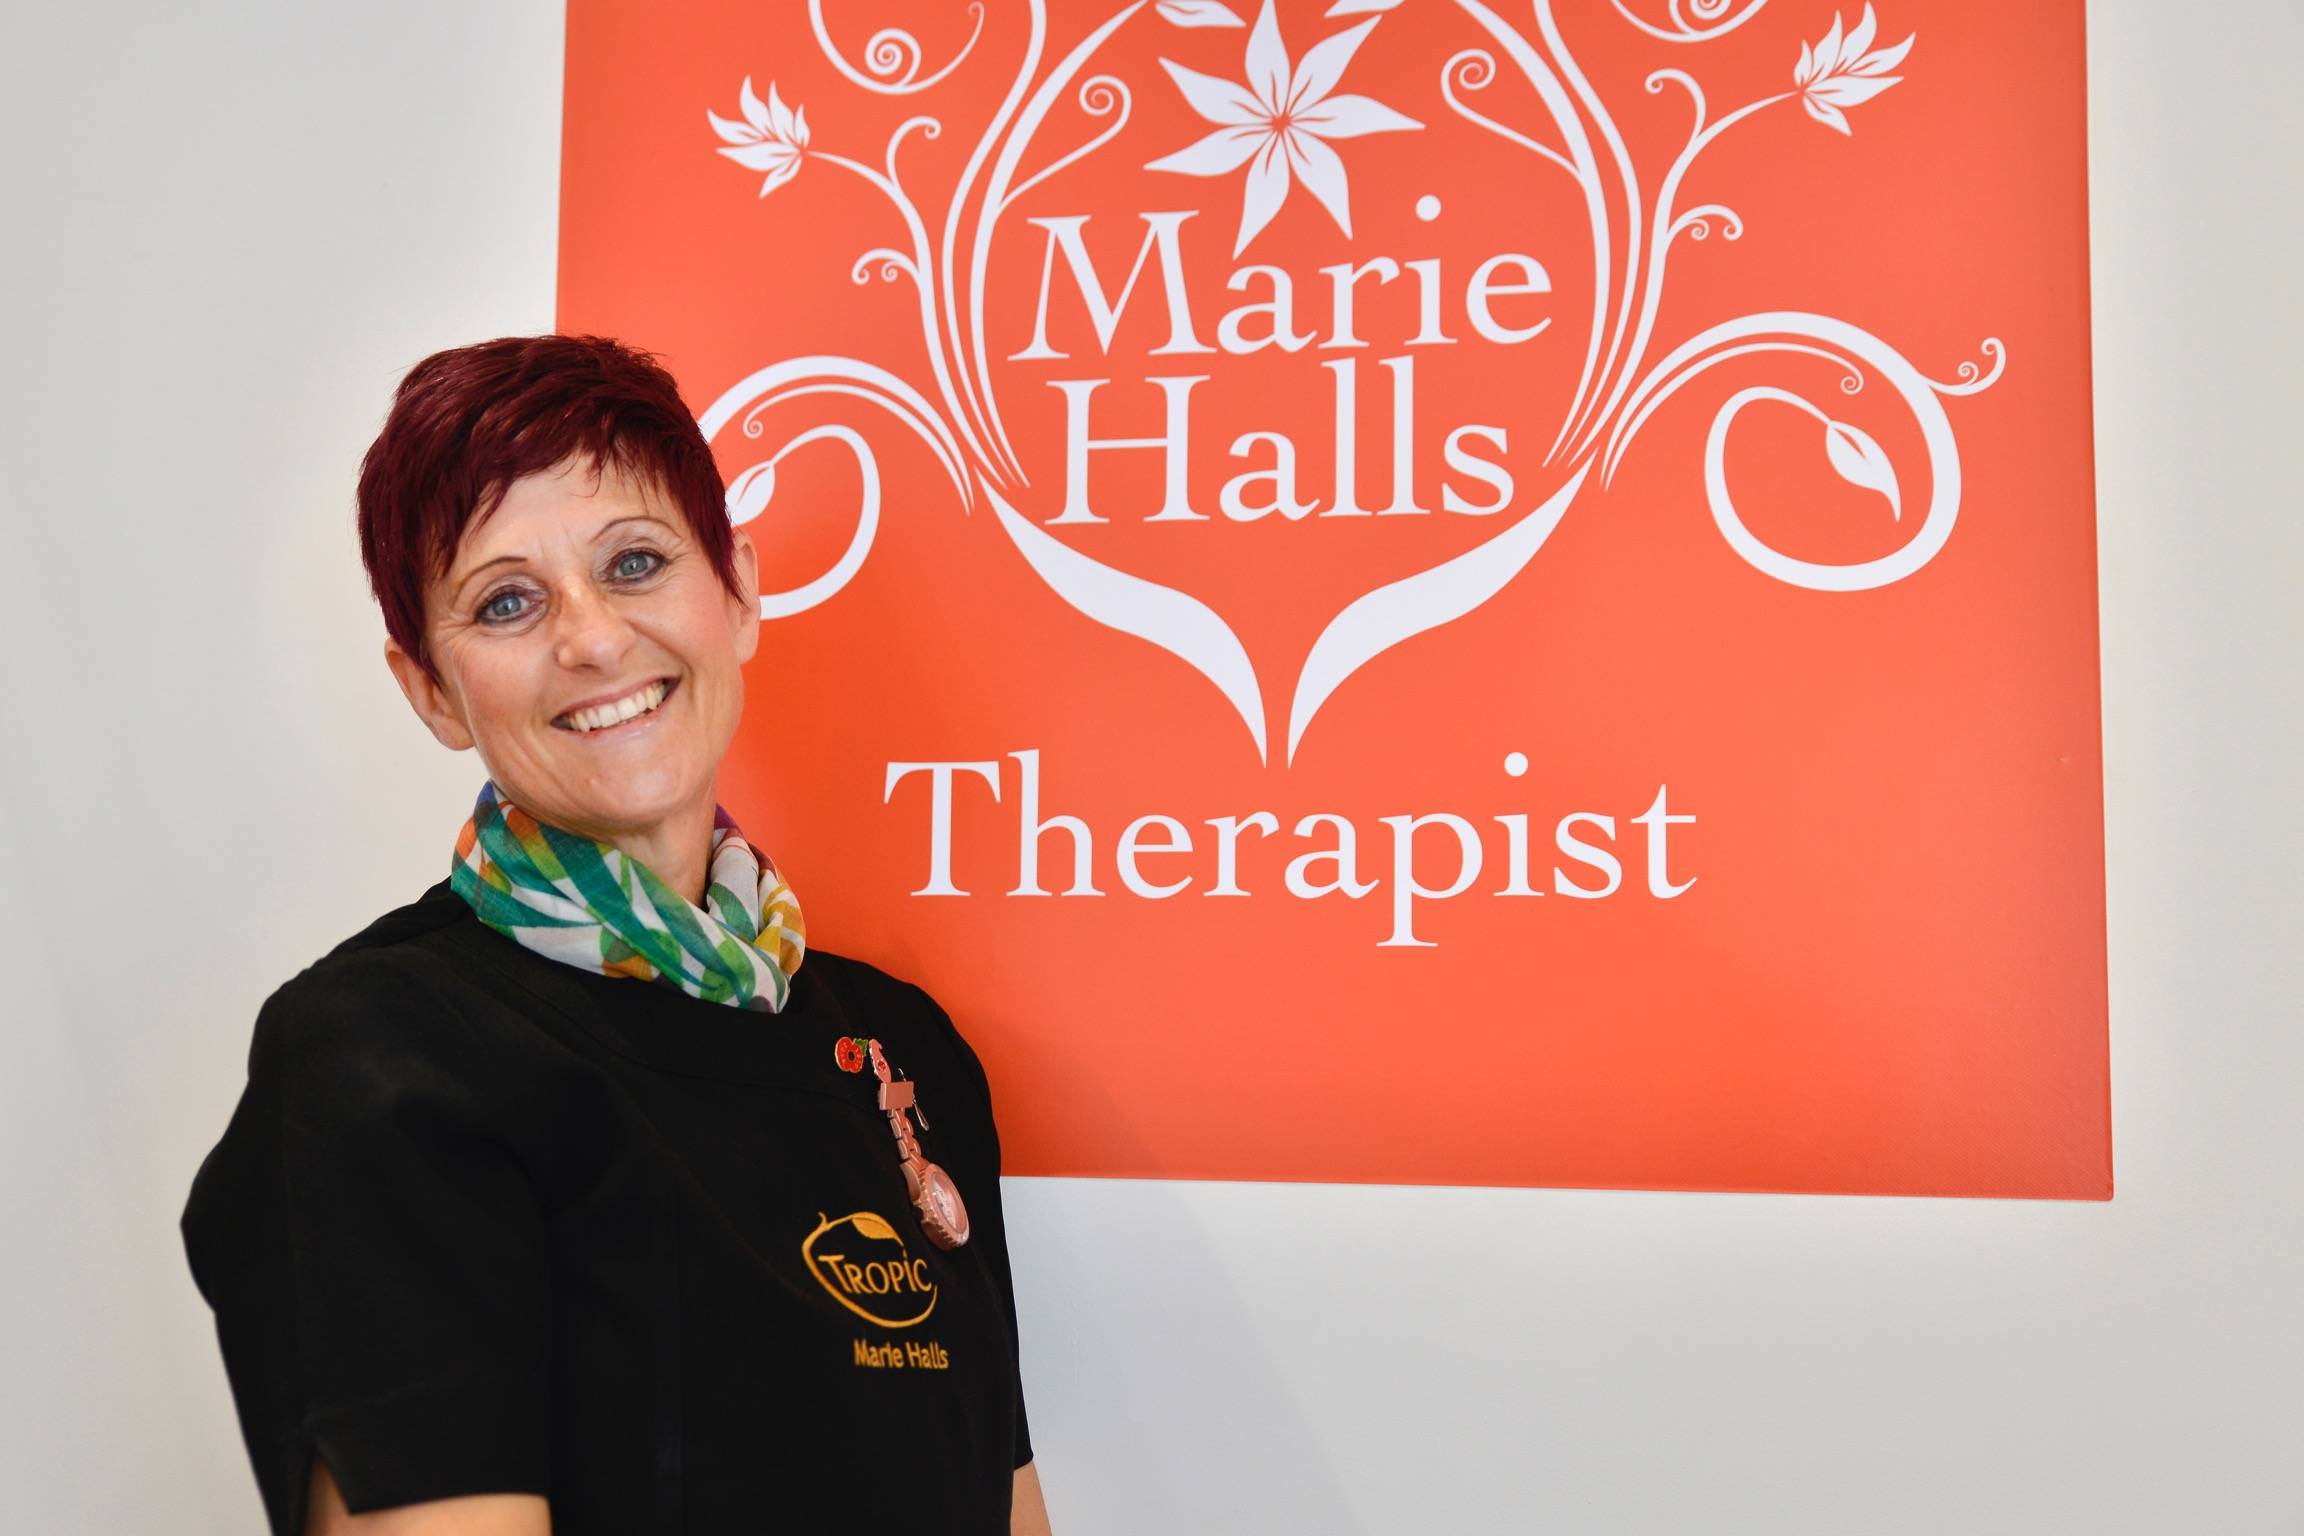 MARIE HALLS